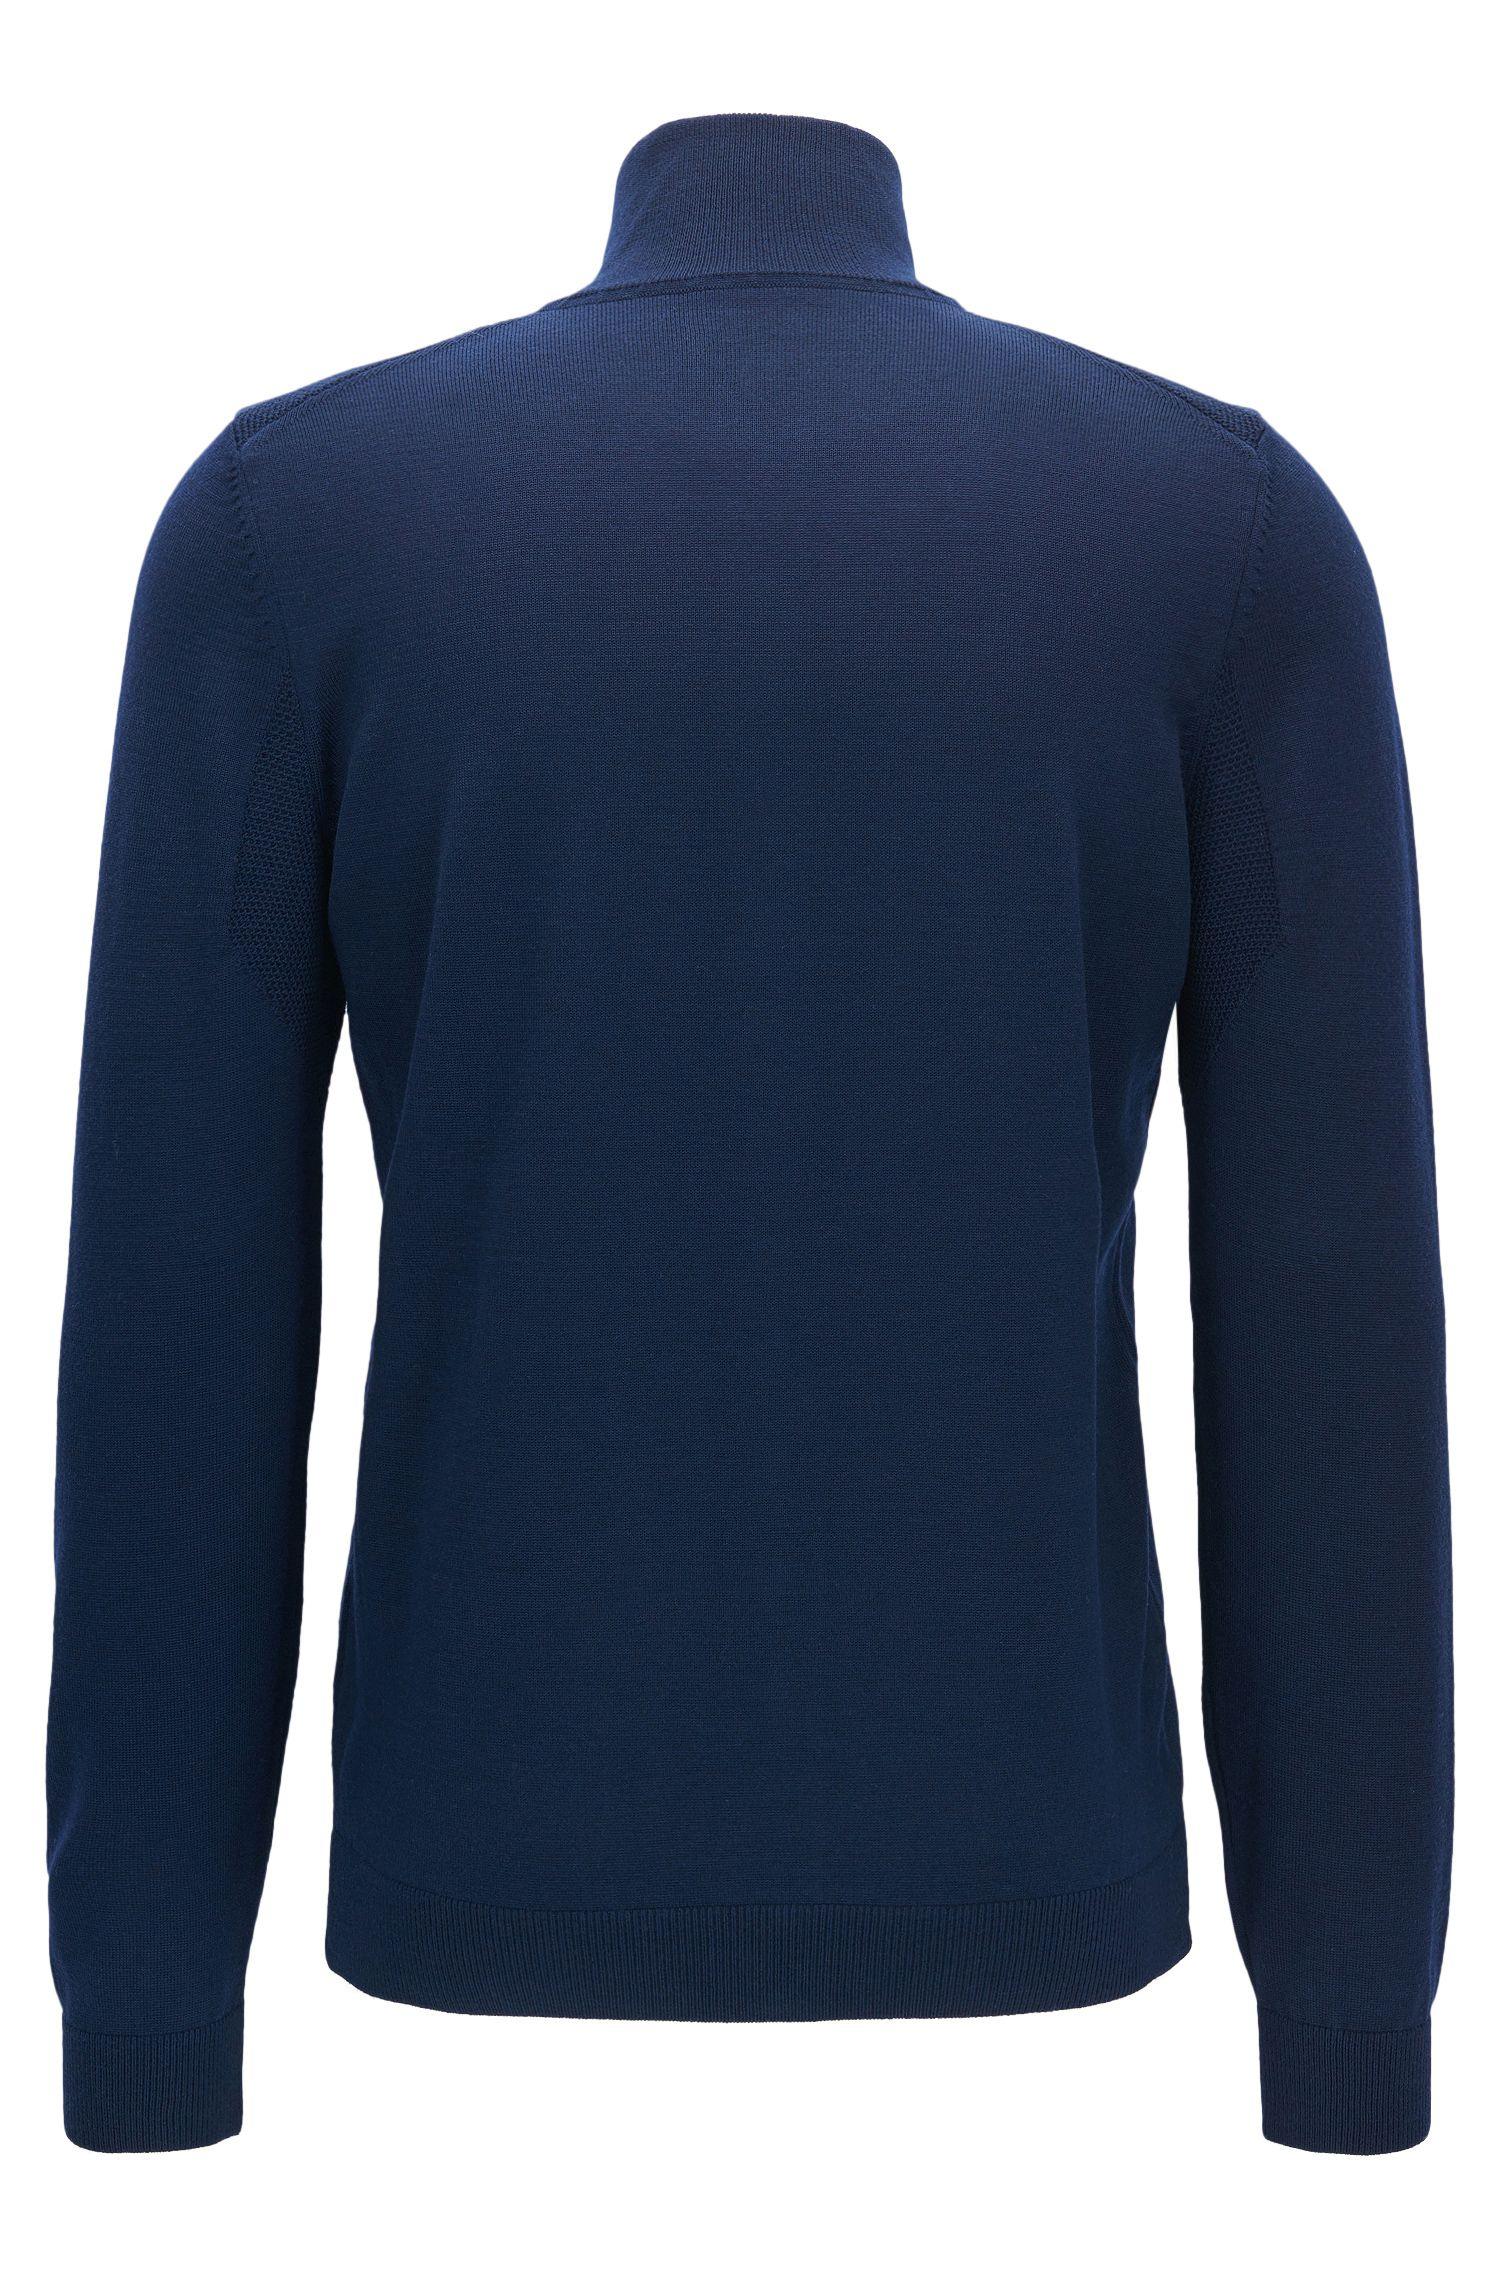 Virgin Wool Full-Zip Sweater Jacket | Zeen Pro, Dark Blue